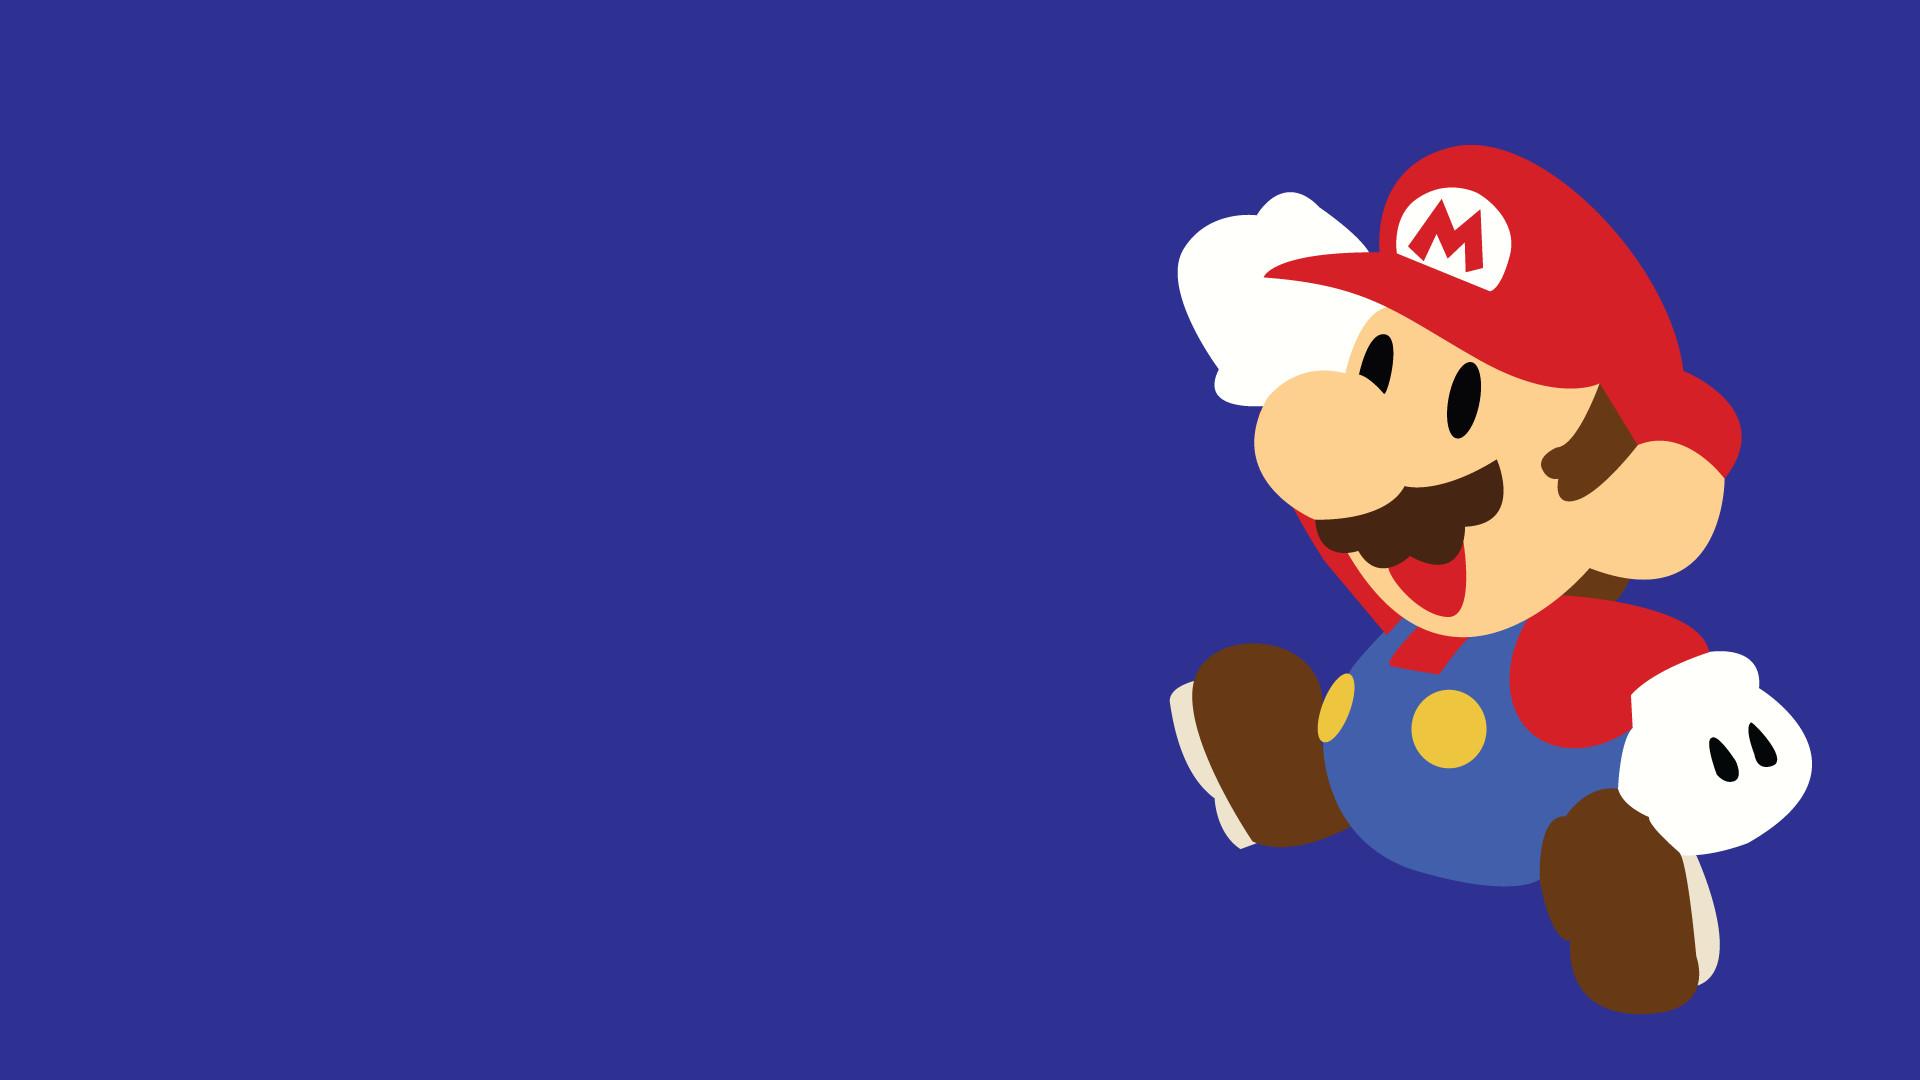 Super Mario Wallpaper Iphone 5 Mario Boo Wallpaper 64 Images